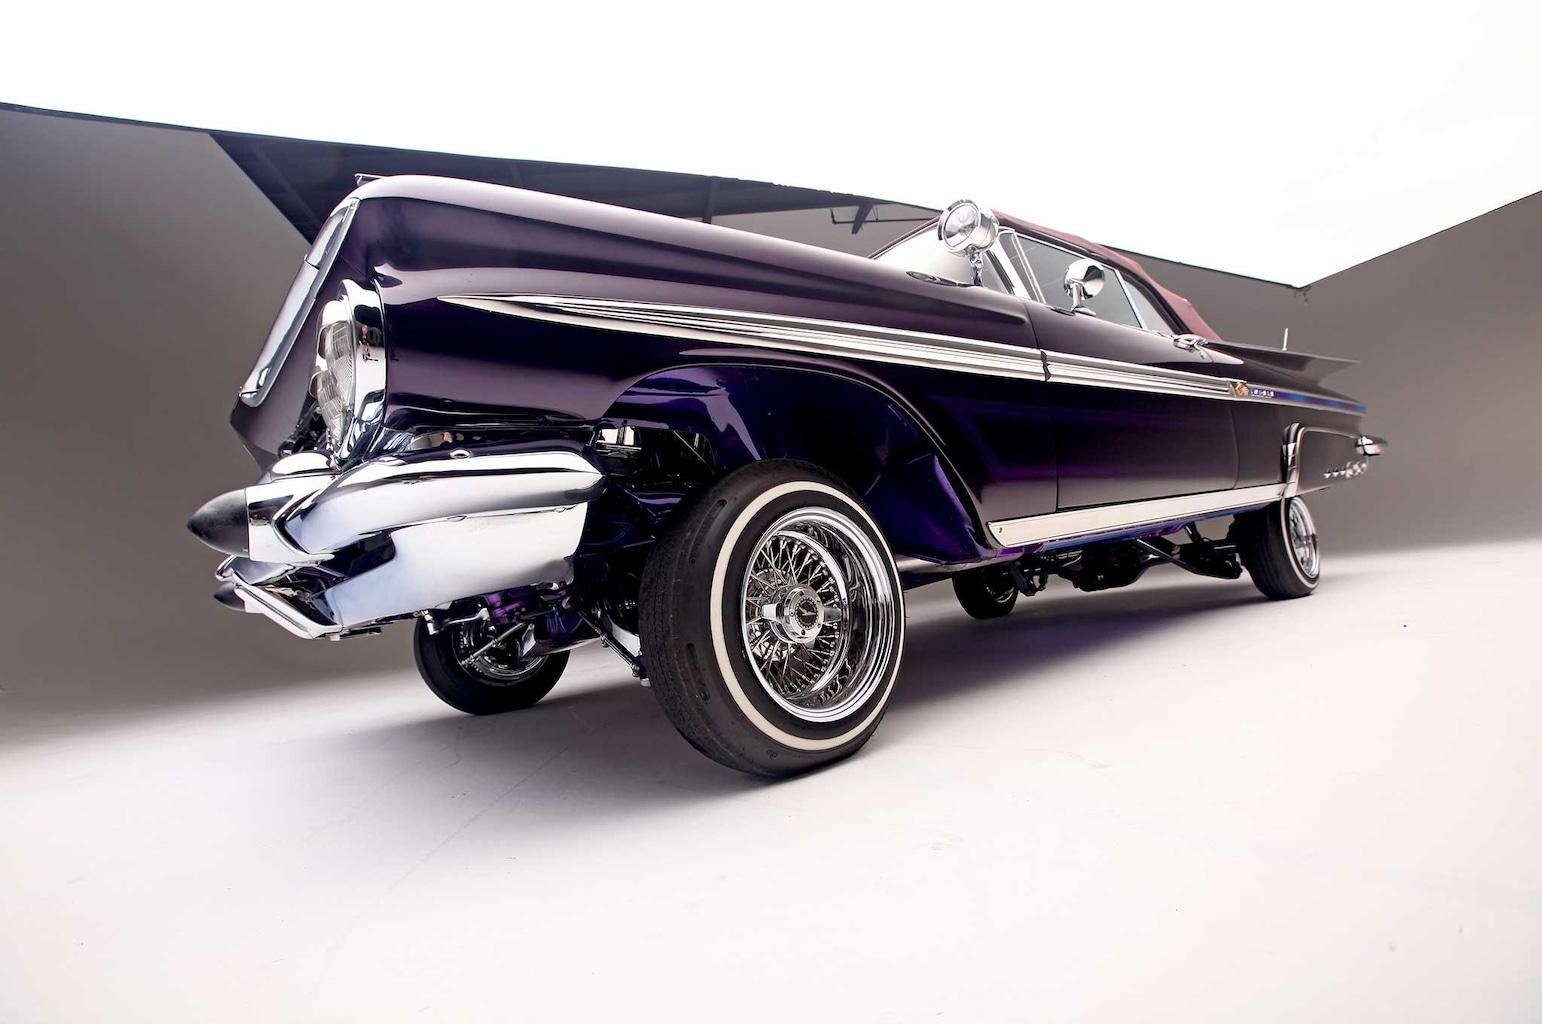 025 1959 chevrolet impala convertible zenith wheel